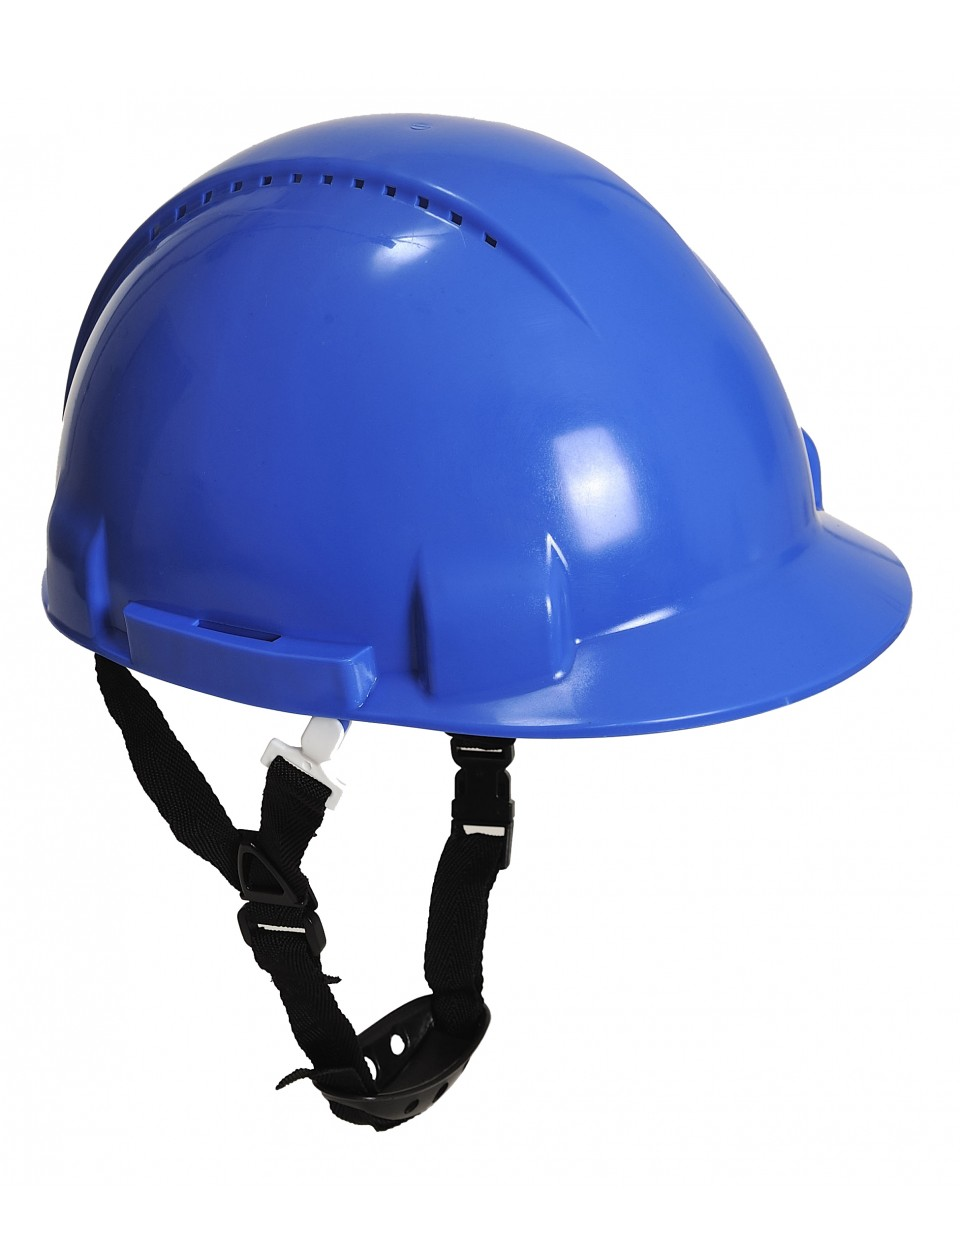 Portwest PW97 Climbing Hard Hat Helmet Personal Protective Equipment